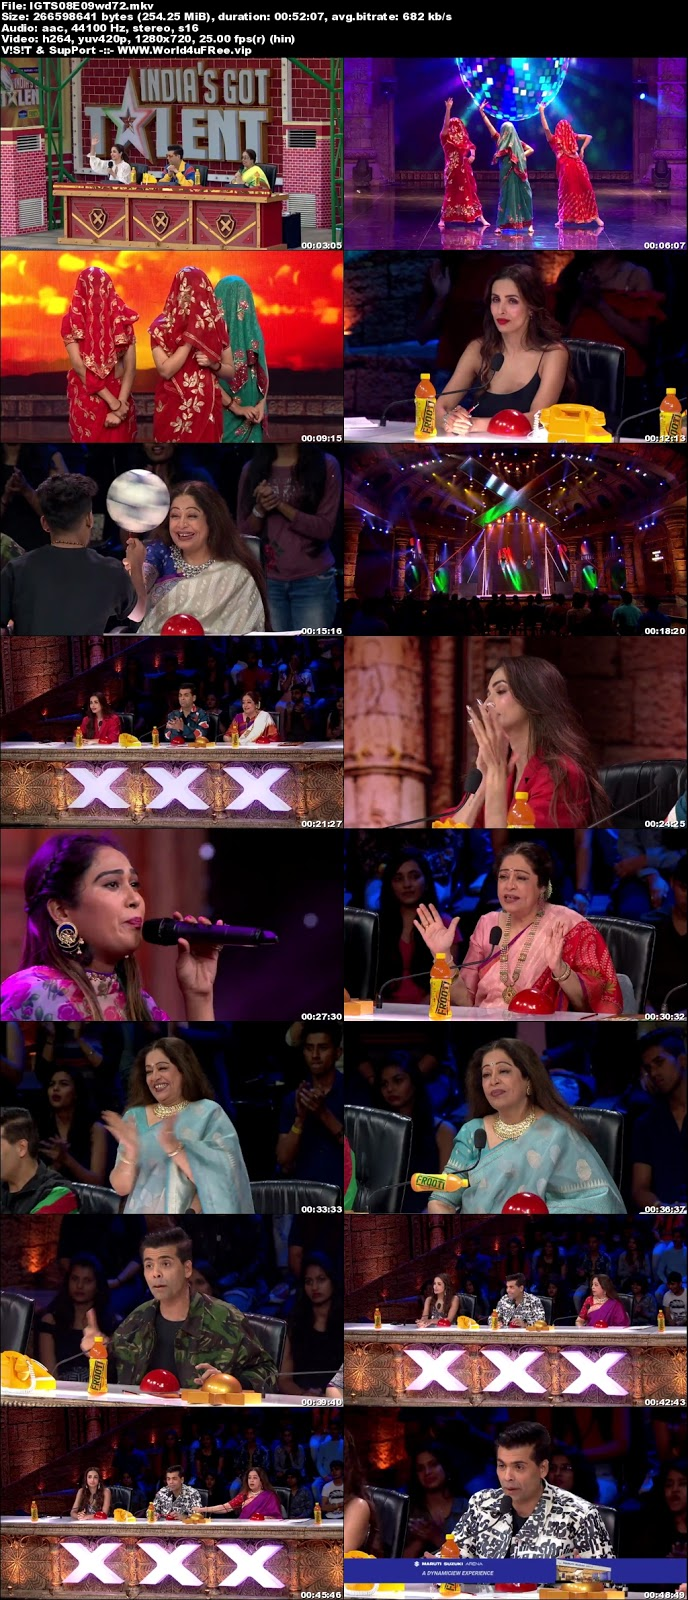 India's Got Talent S08 Episode 09 720p WEBRip 250mb x264 world4ufree.funtv show India's Got Talent Season 8 Star Plus tv show HD 720p free download or watch online at world4ufree.fun